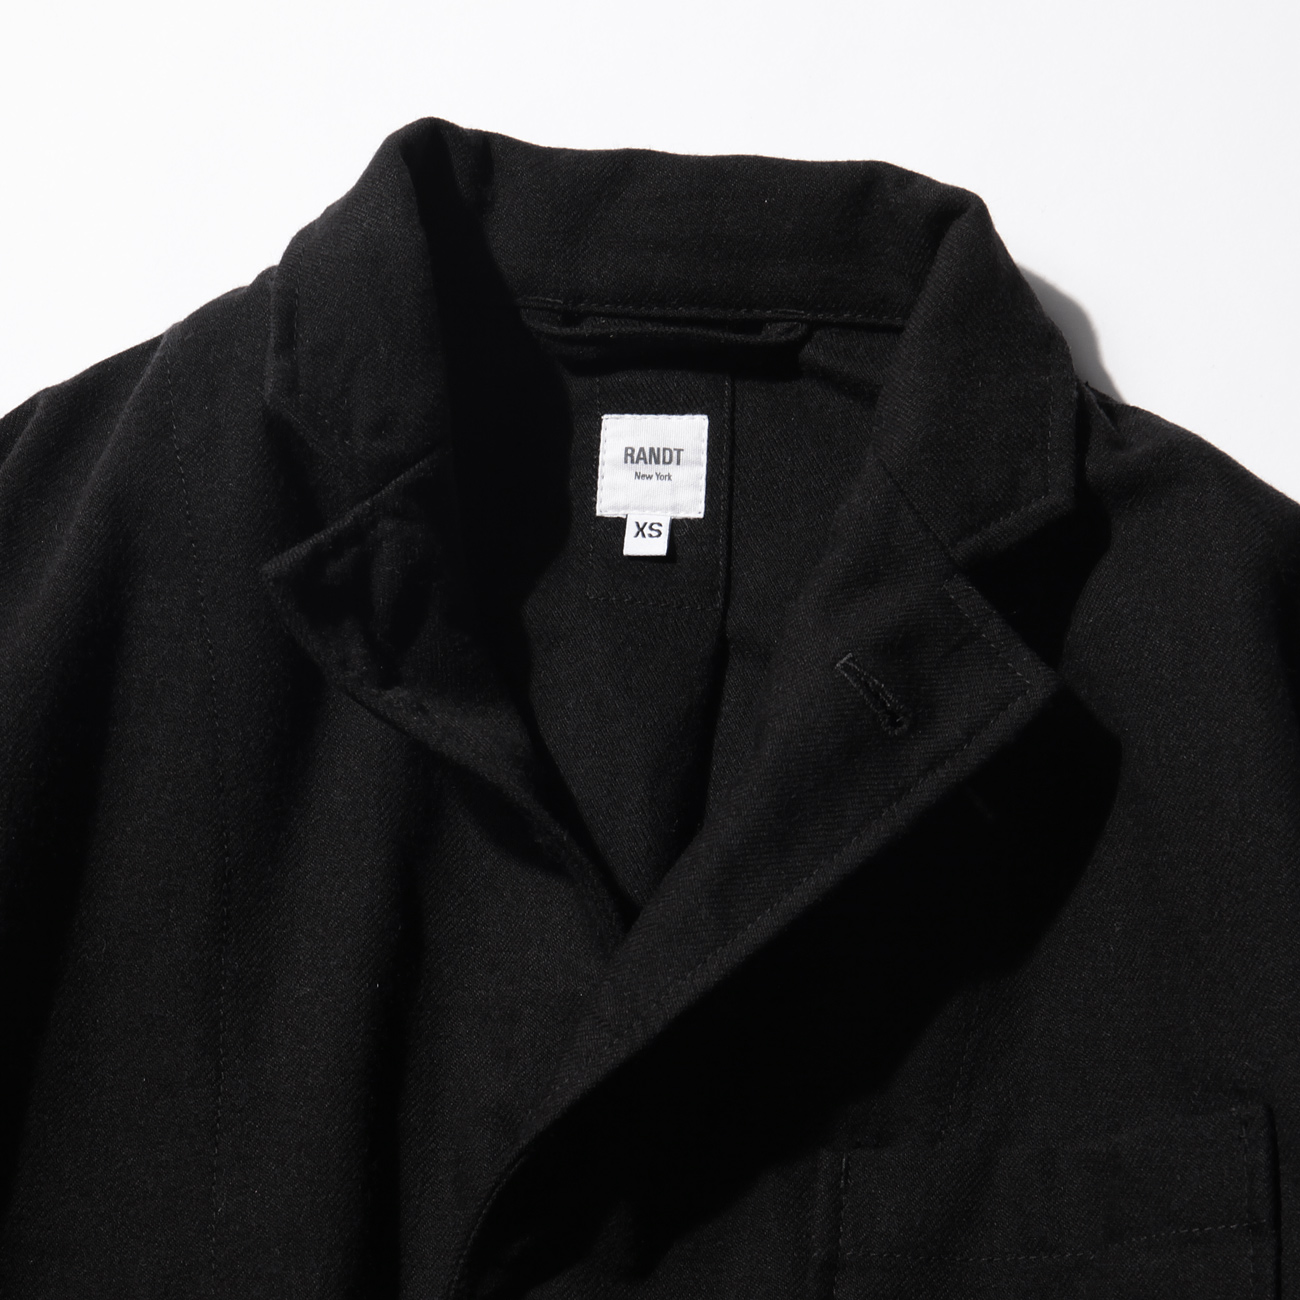 RANDT - Studio Jacket - Wool Acrylic Serge - Black